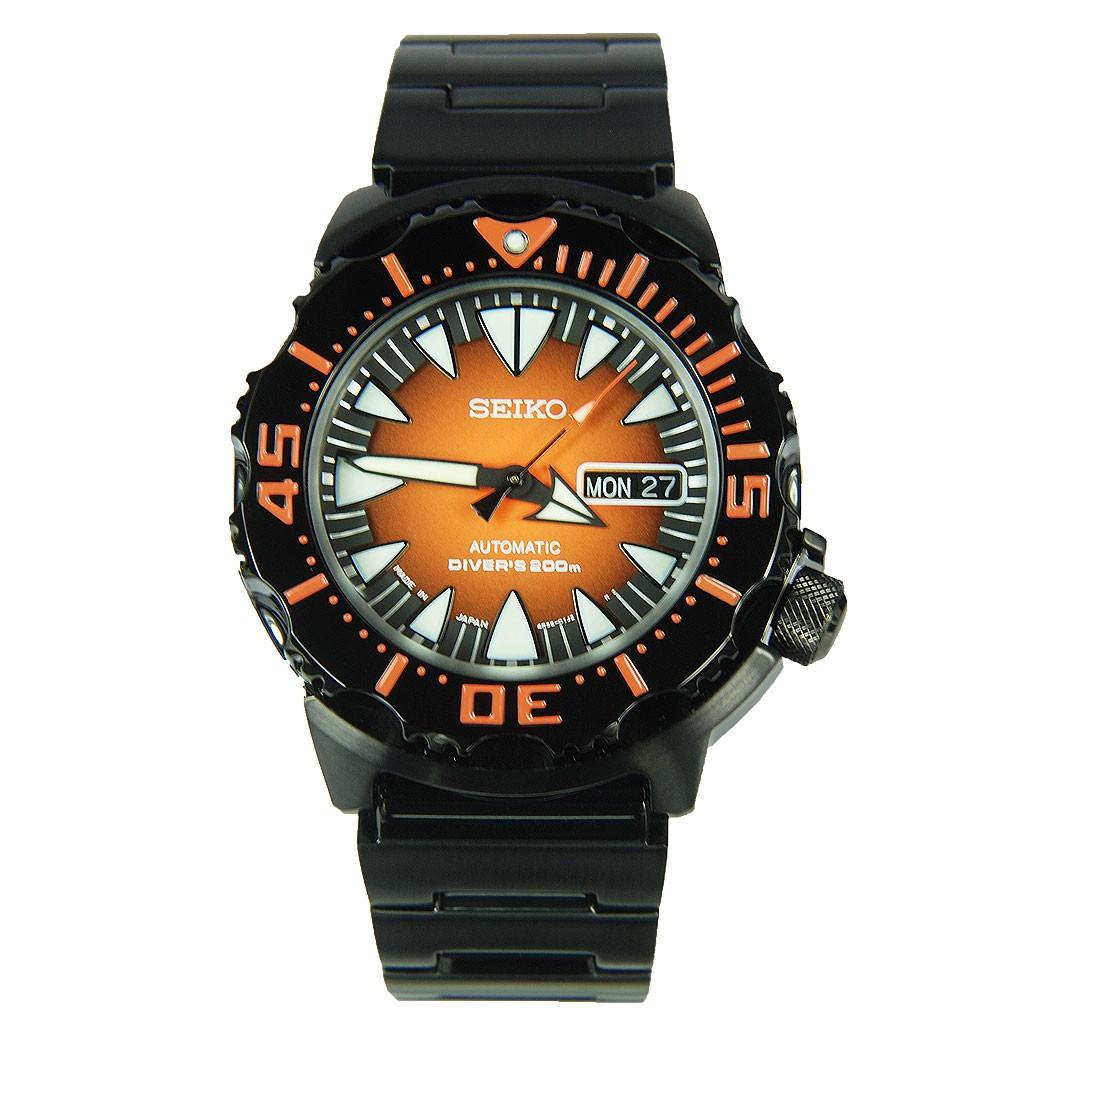 Часы Seiko Black / Orange Monster SRP311J1 Automatic Diver's 4R36 В.